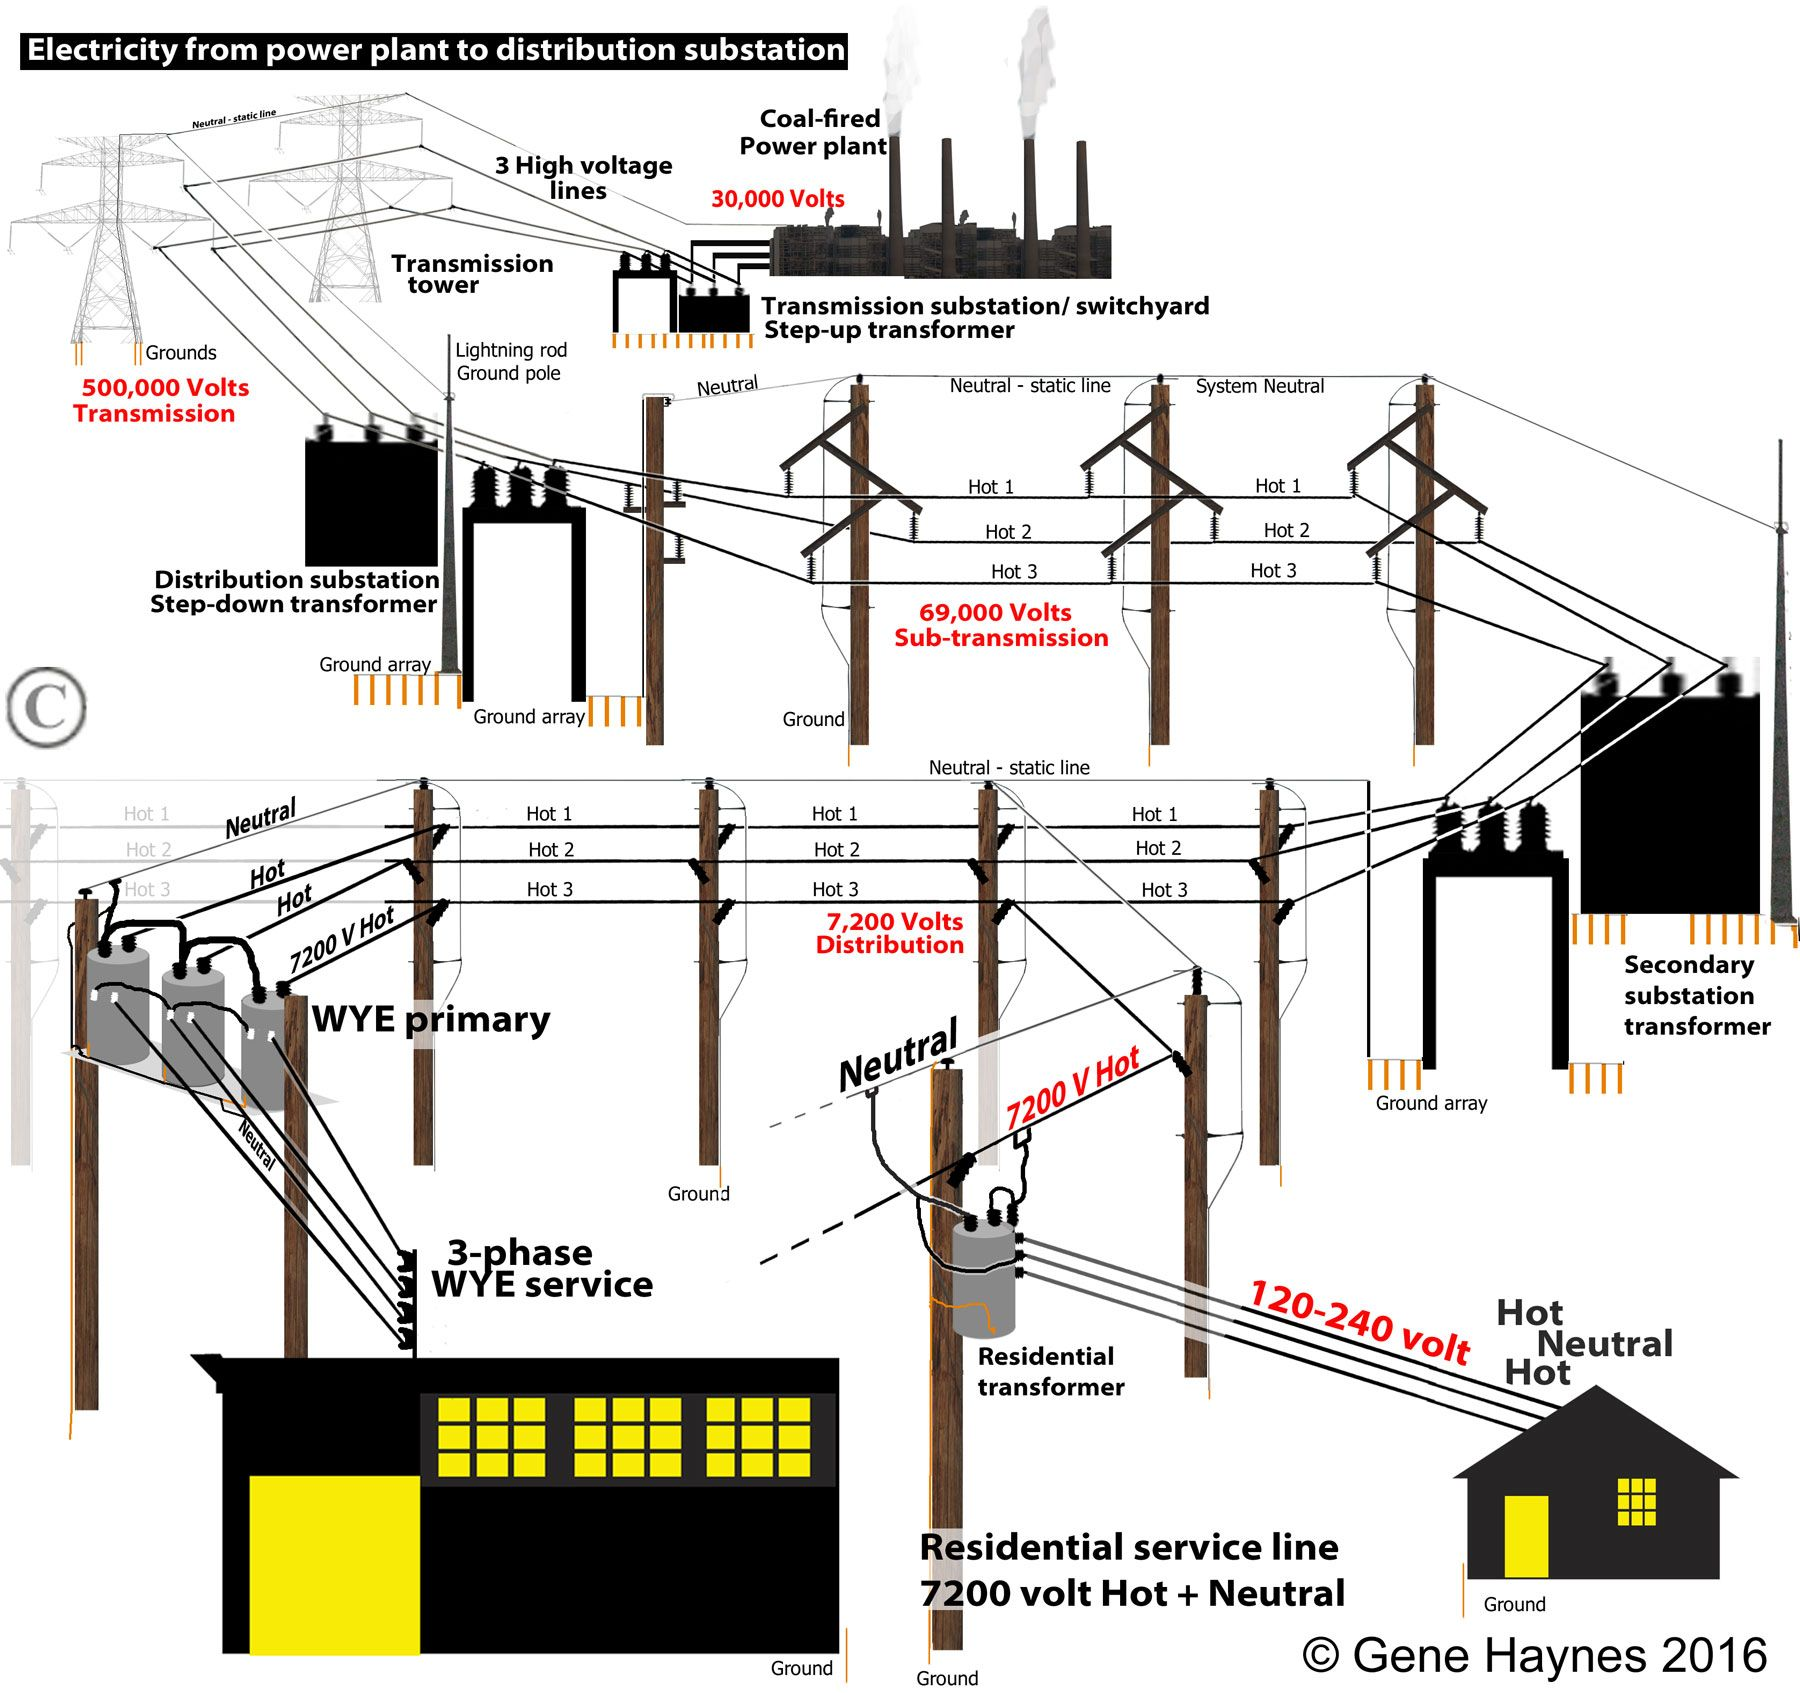 Electricityfromplanttodistributiontransformerto